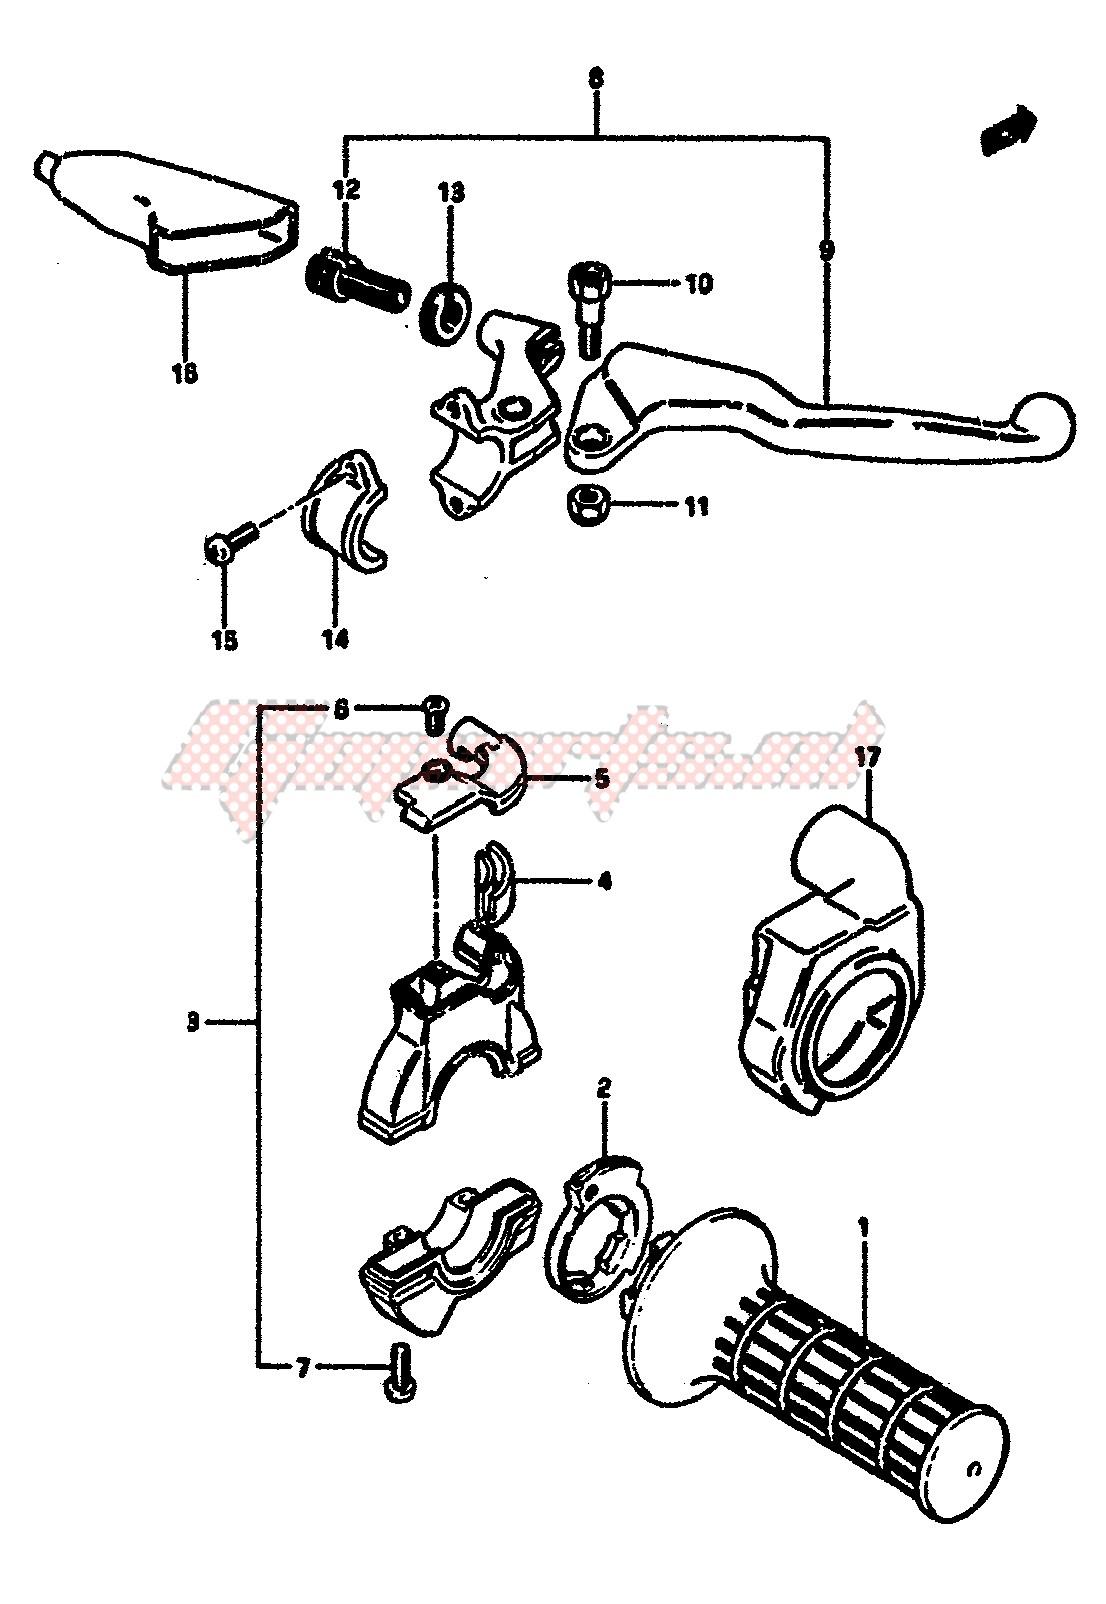 RIGHT HANDLE SWITCH (MODEL E) blueprint